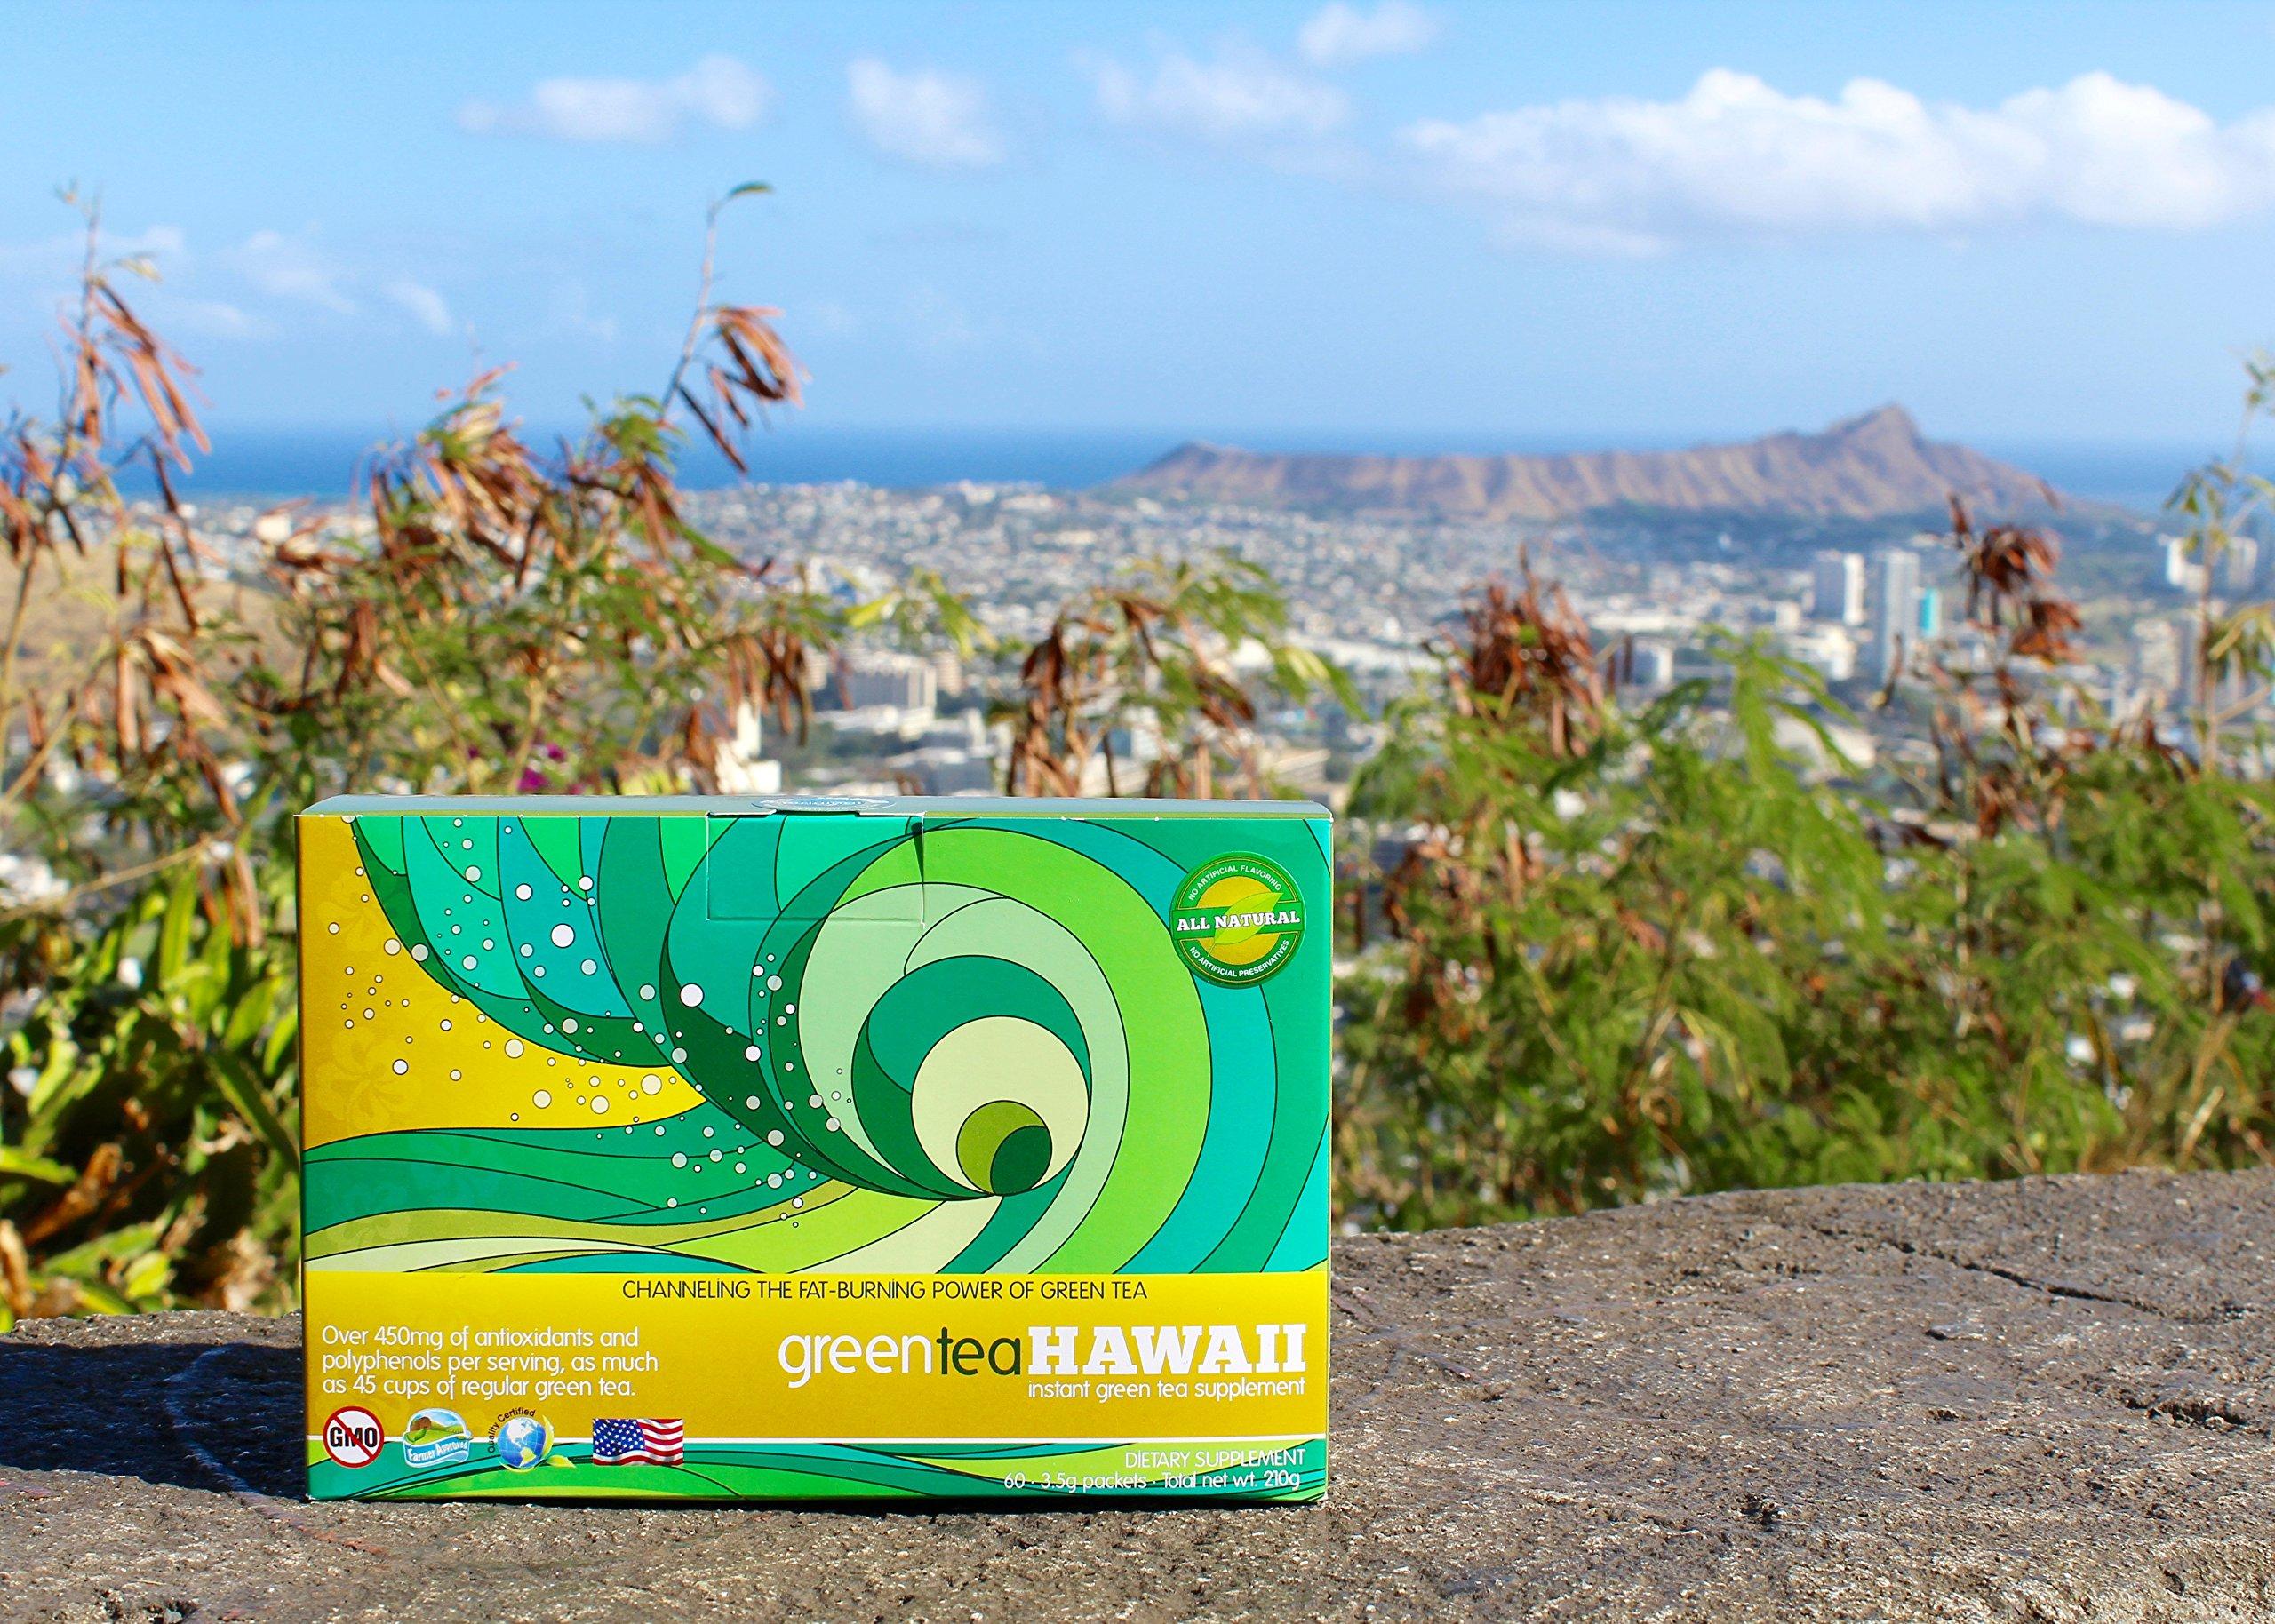 Green Tea Hawaii--60 Count--30 Day Supply (Passion Orange Guava Flavor)